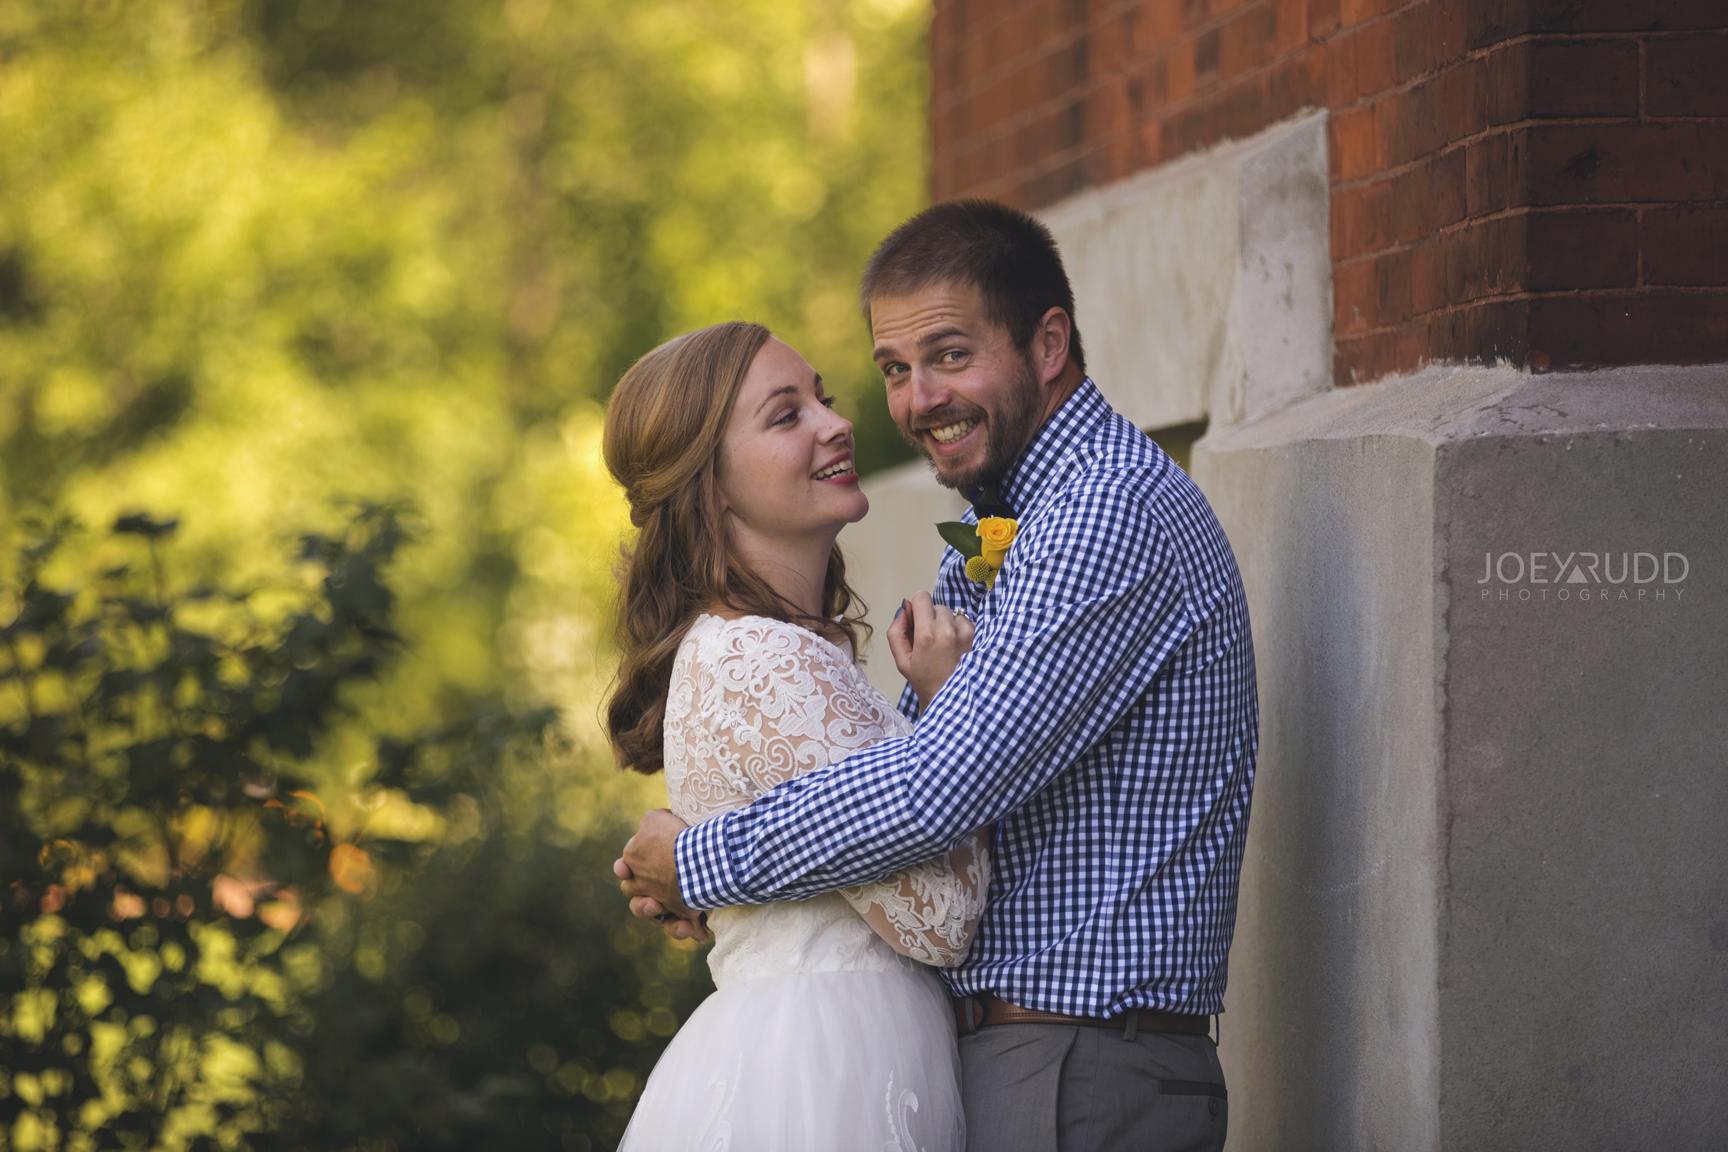 Ottawa Elopement by Joey Rudd Photography Ottawa Wedding Photographer Mer Bleue Ottawa Wedding Chapel Candid Couple